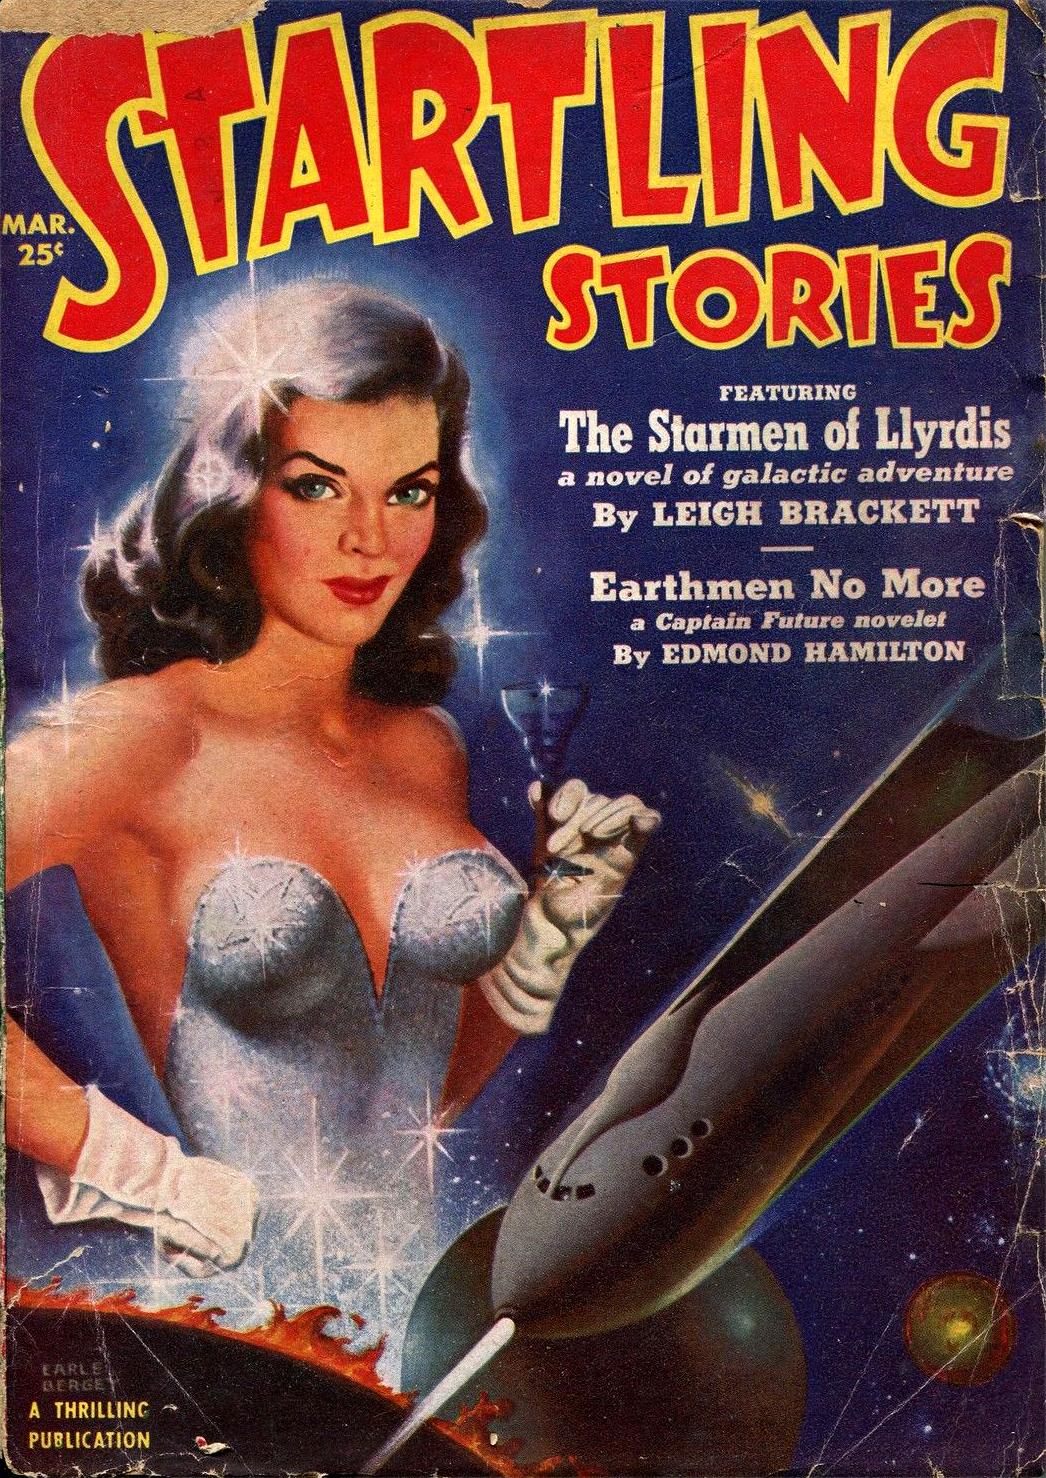 Startling-Stories-Pulp-March-1951.jpg